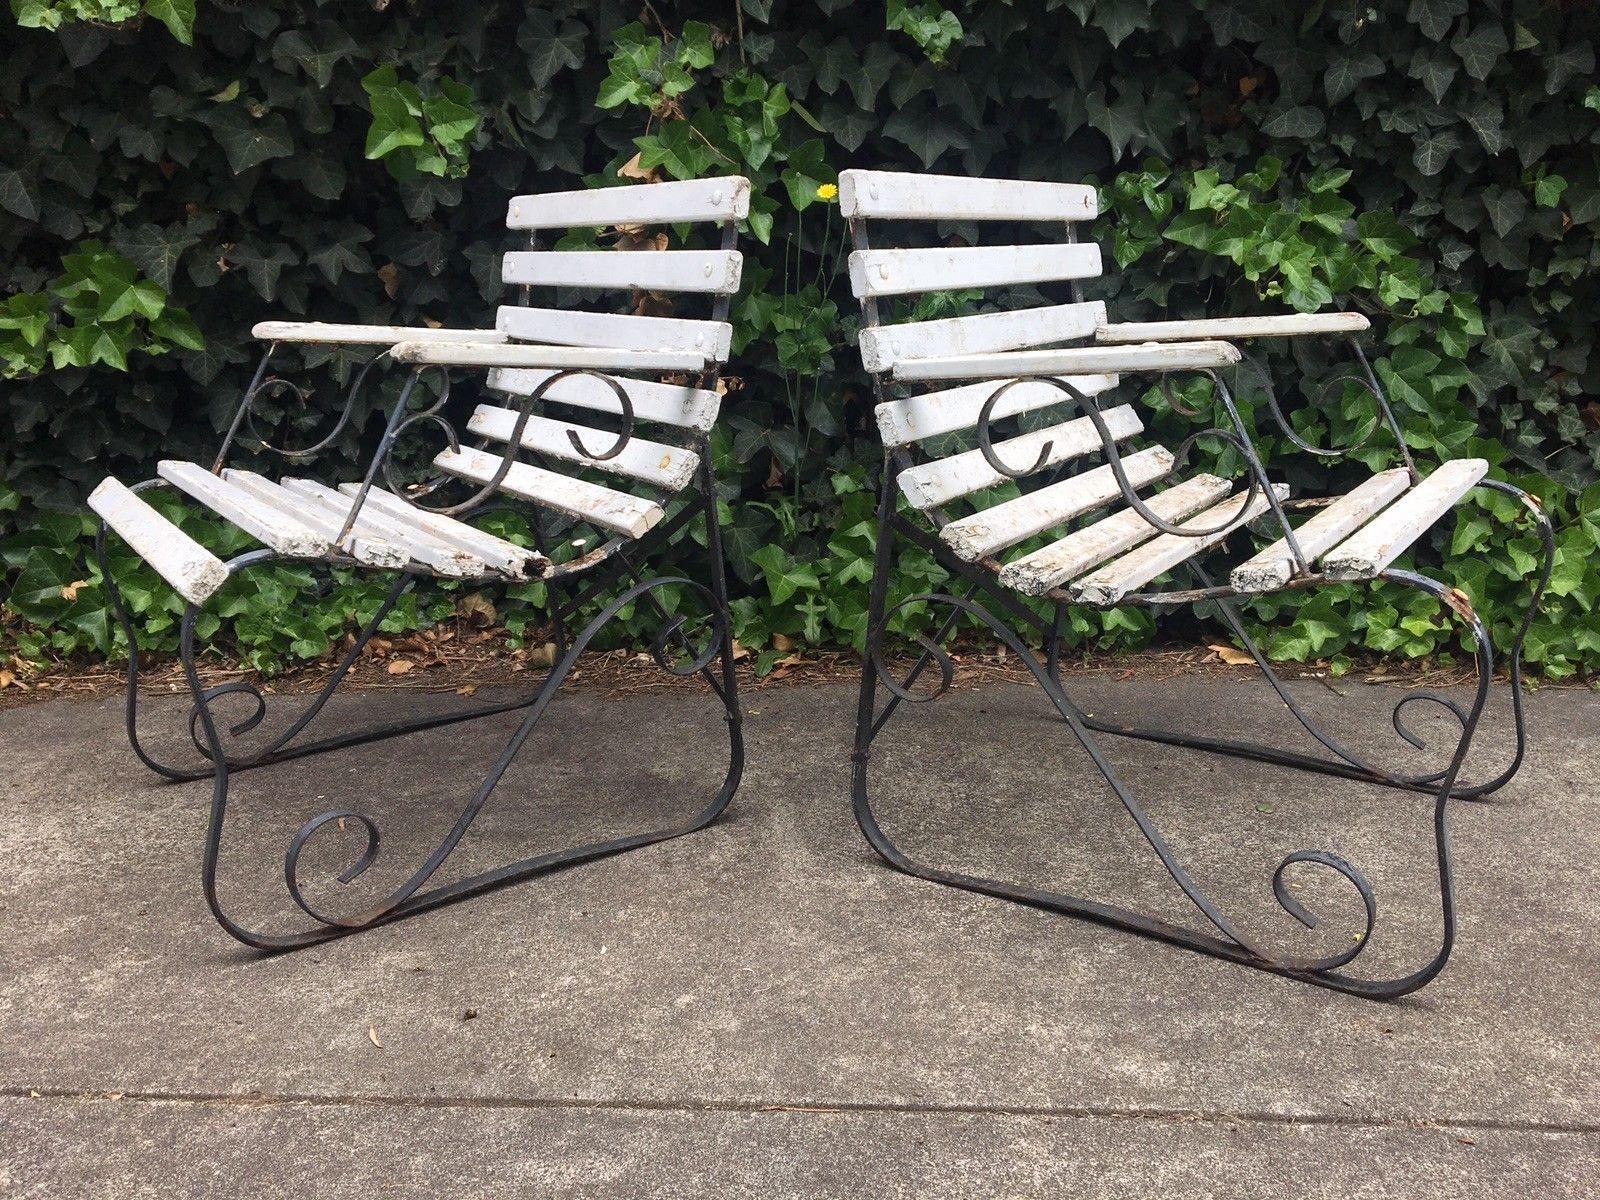 Retro Vintage 50s Wrought Iron Outdoor Chairs Atomic Rustic Mid Century Ebay Iron Patio Furniture Outdoor Chairs Wrought Iron Patio Furniture